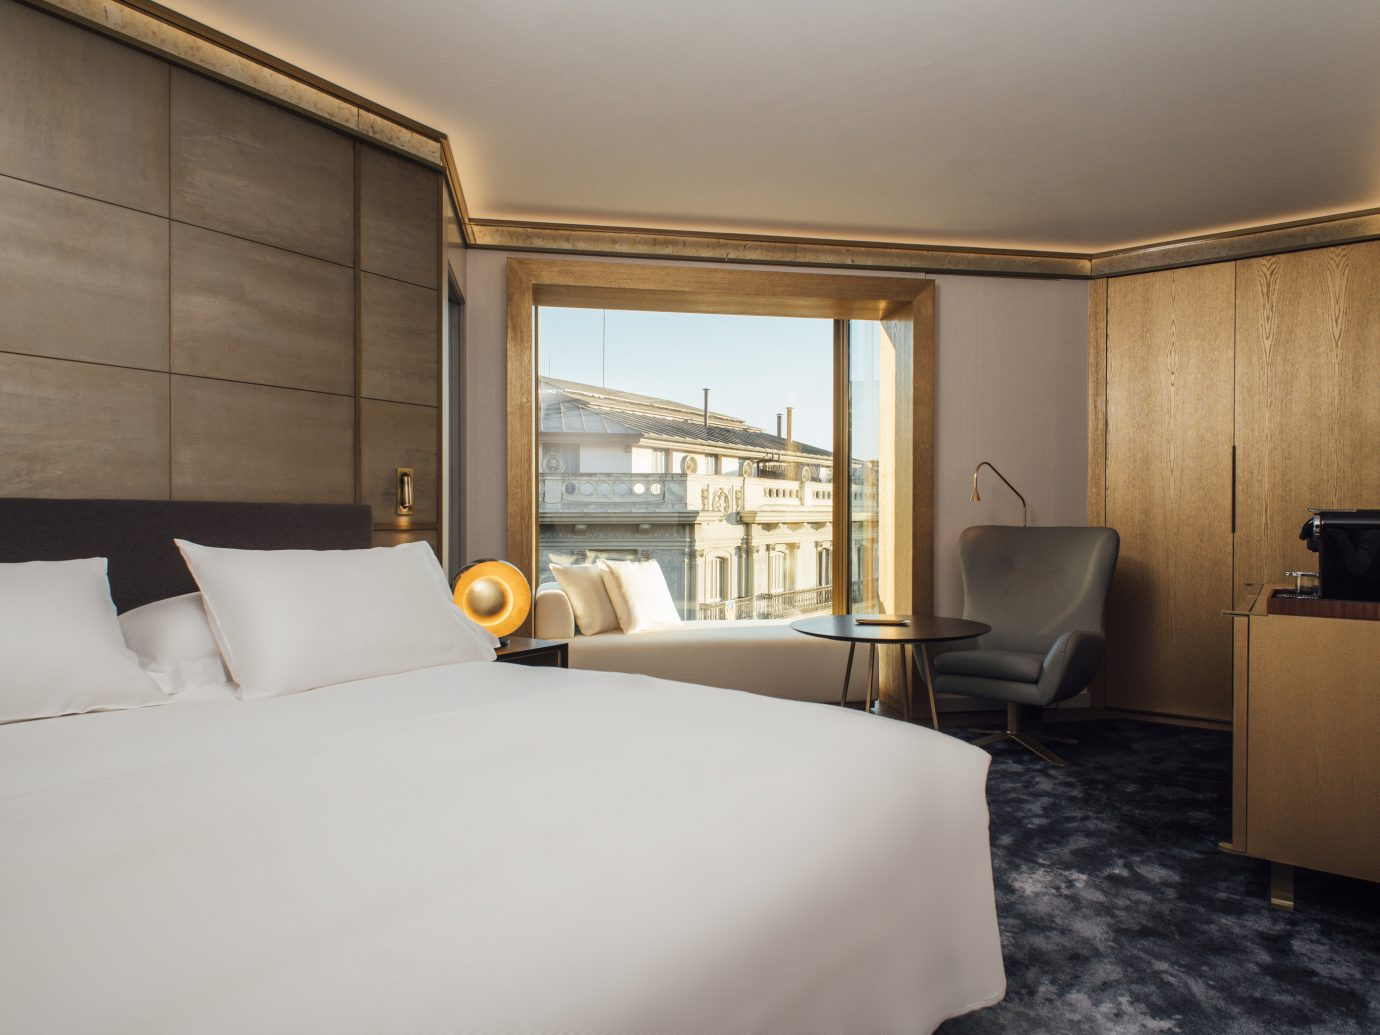 Bedroom at Almanac Barcelona